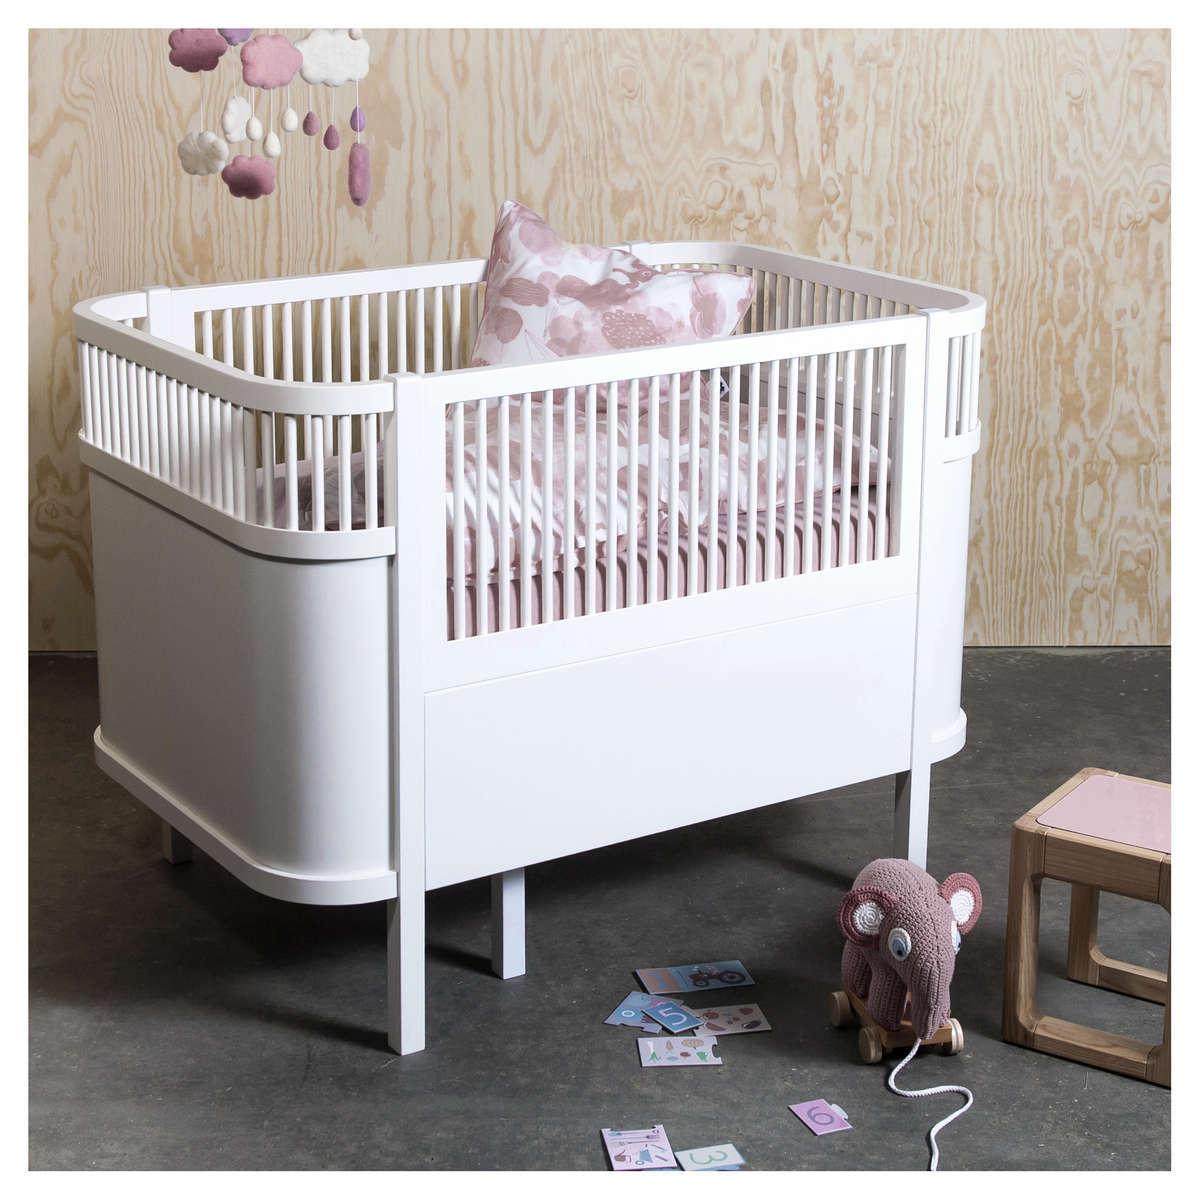 acheter lit bb lit volutif sebra bed blanc - Bebe Lit Evolutif